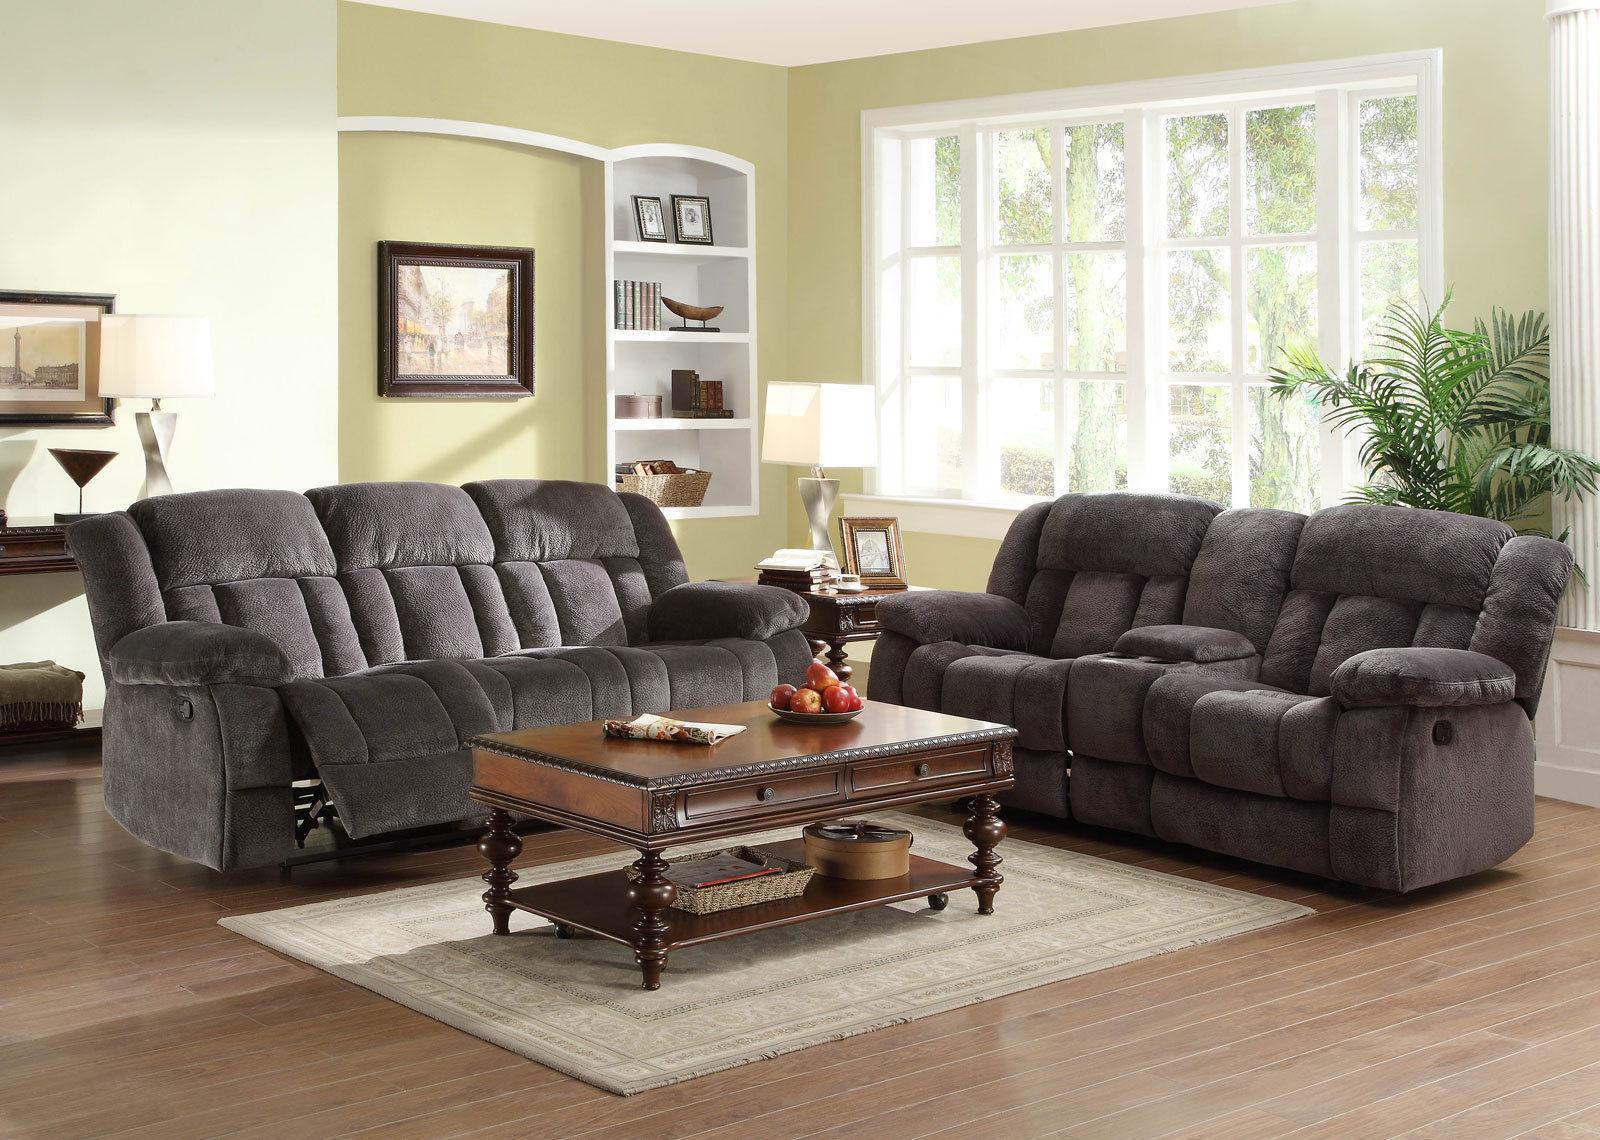 New Lugo Modern Living Room Couch Set Gray Microfiber